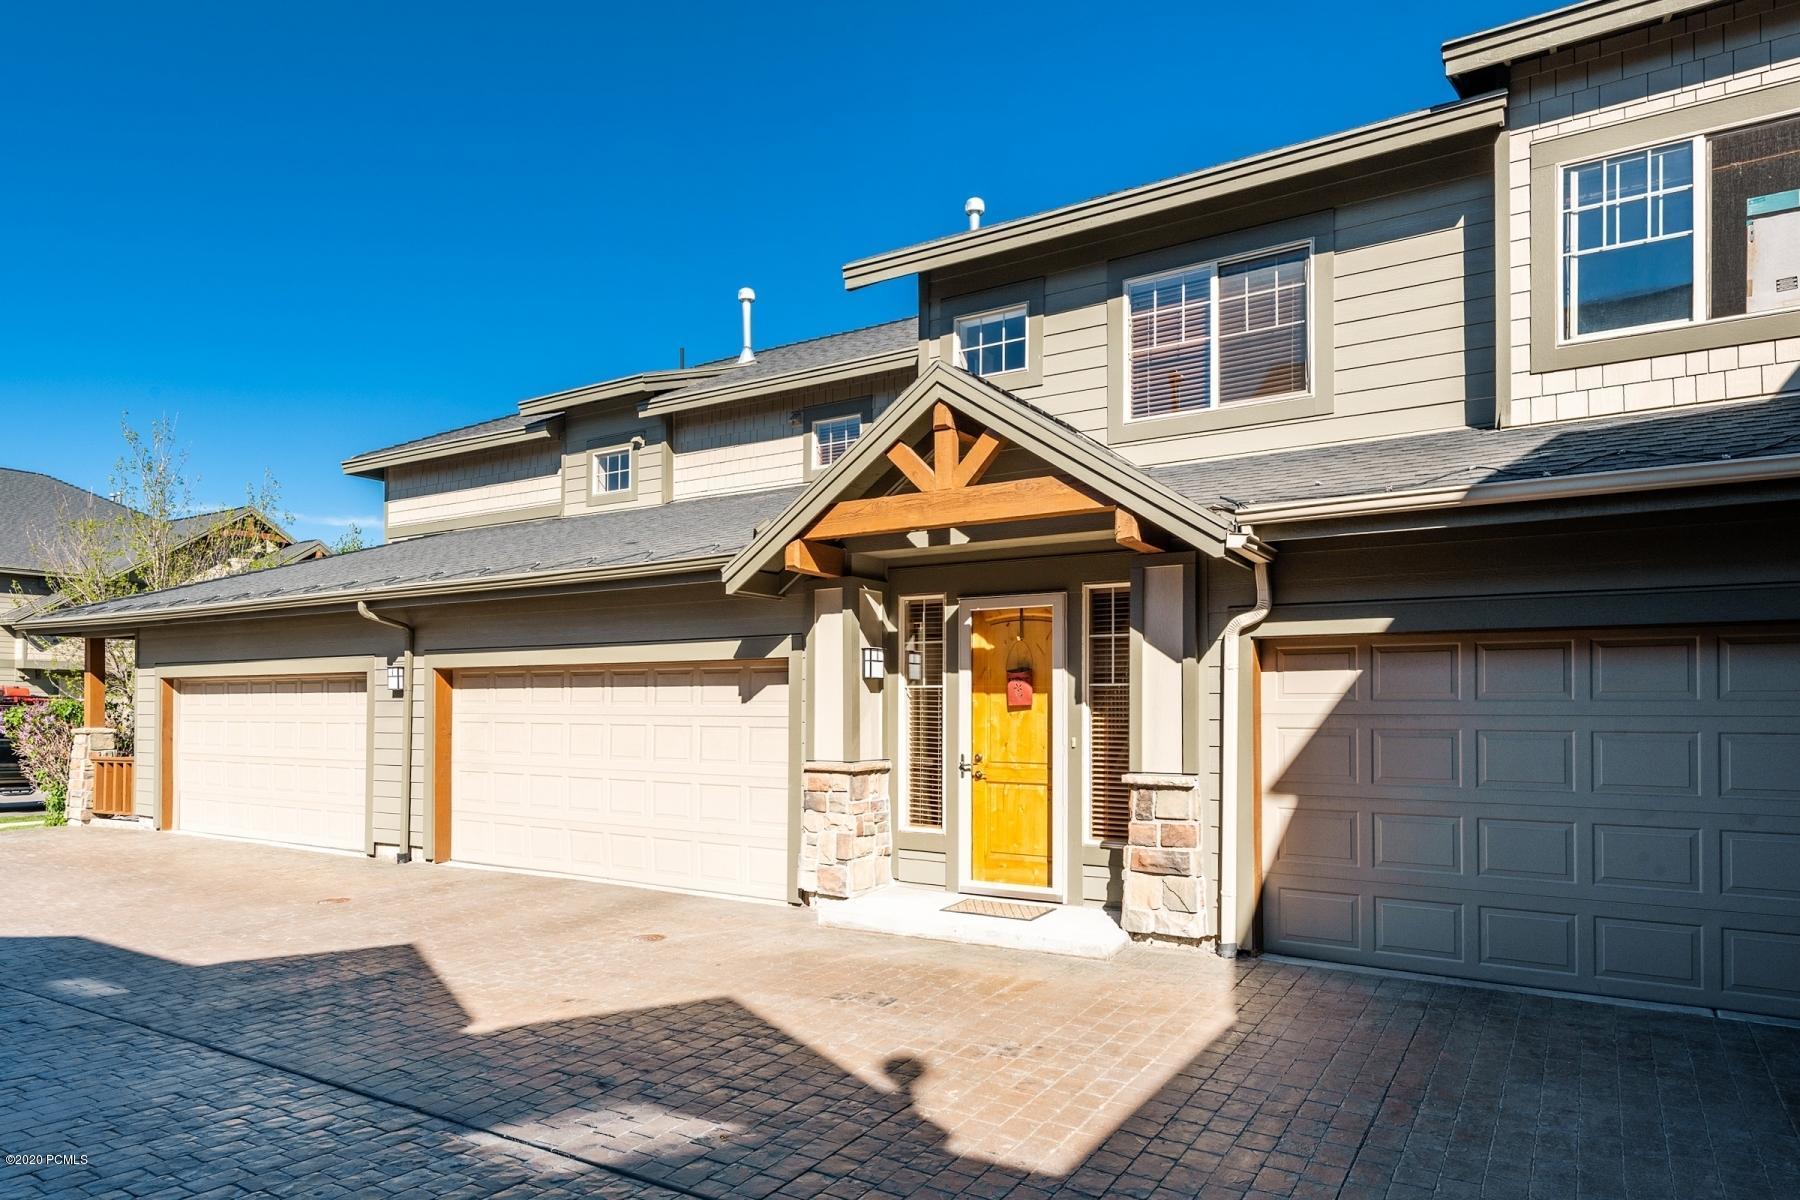 1695 Redstone Avenue, Park City, Utah 84098, 2 Bedrooms Bedrooms, ,3 BathroomsBathrooms,Condominium,For Sale,Redstone,20190109112430415765000000